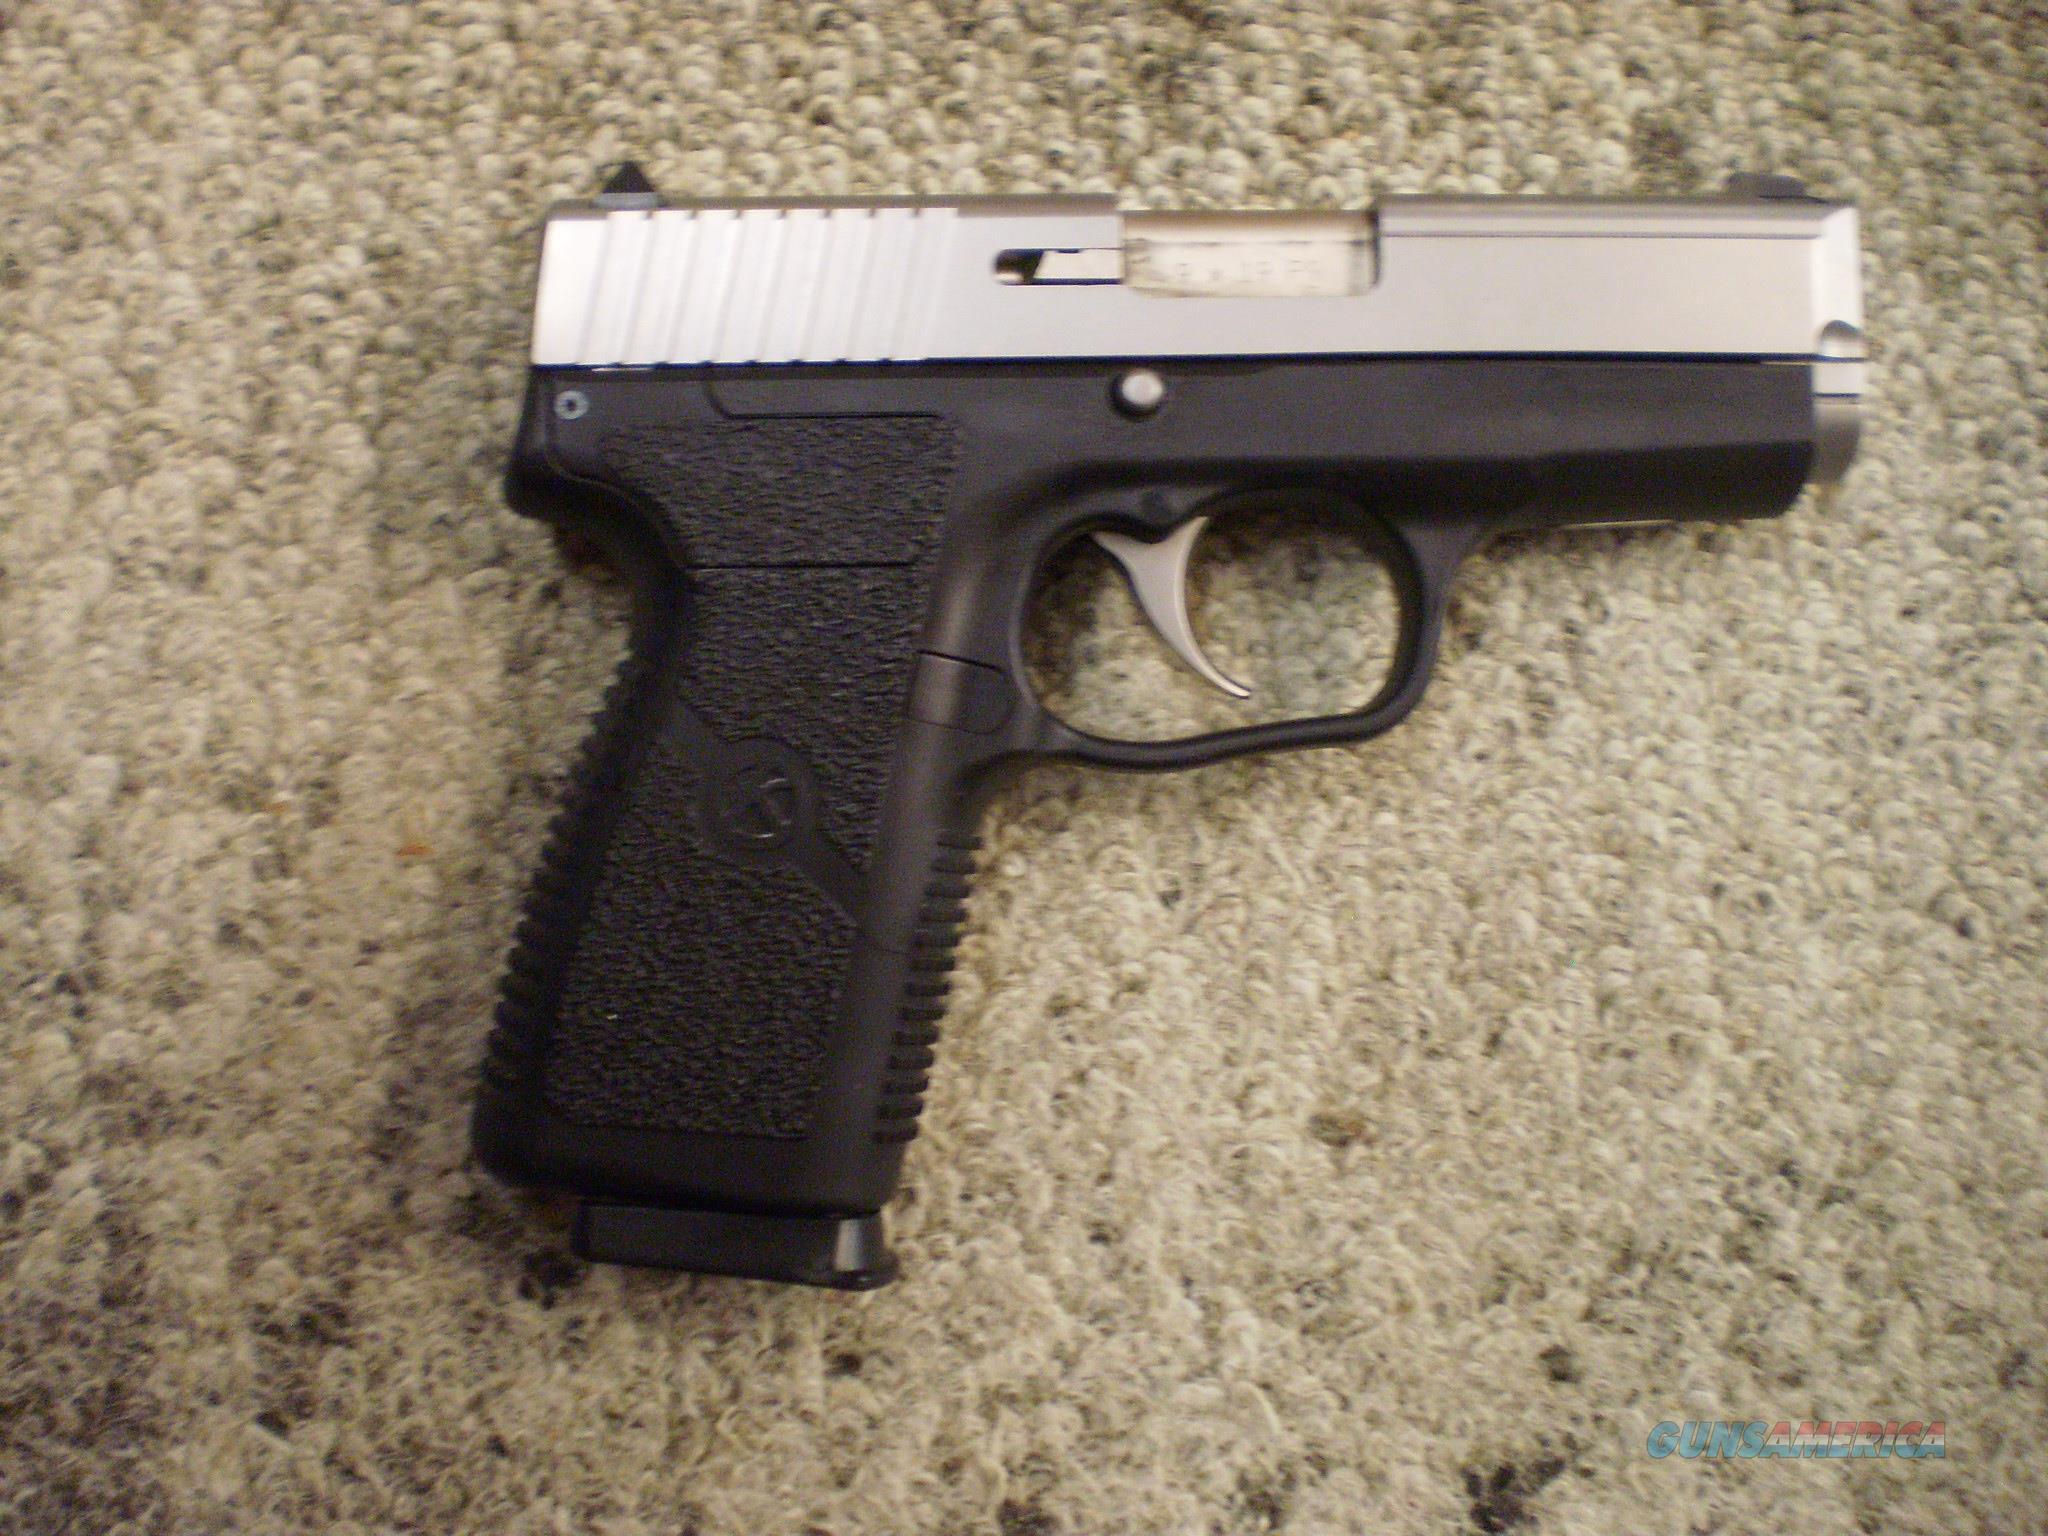 KAHR P9 9MM  Guns > Pistols > Kahr Pistols